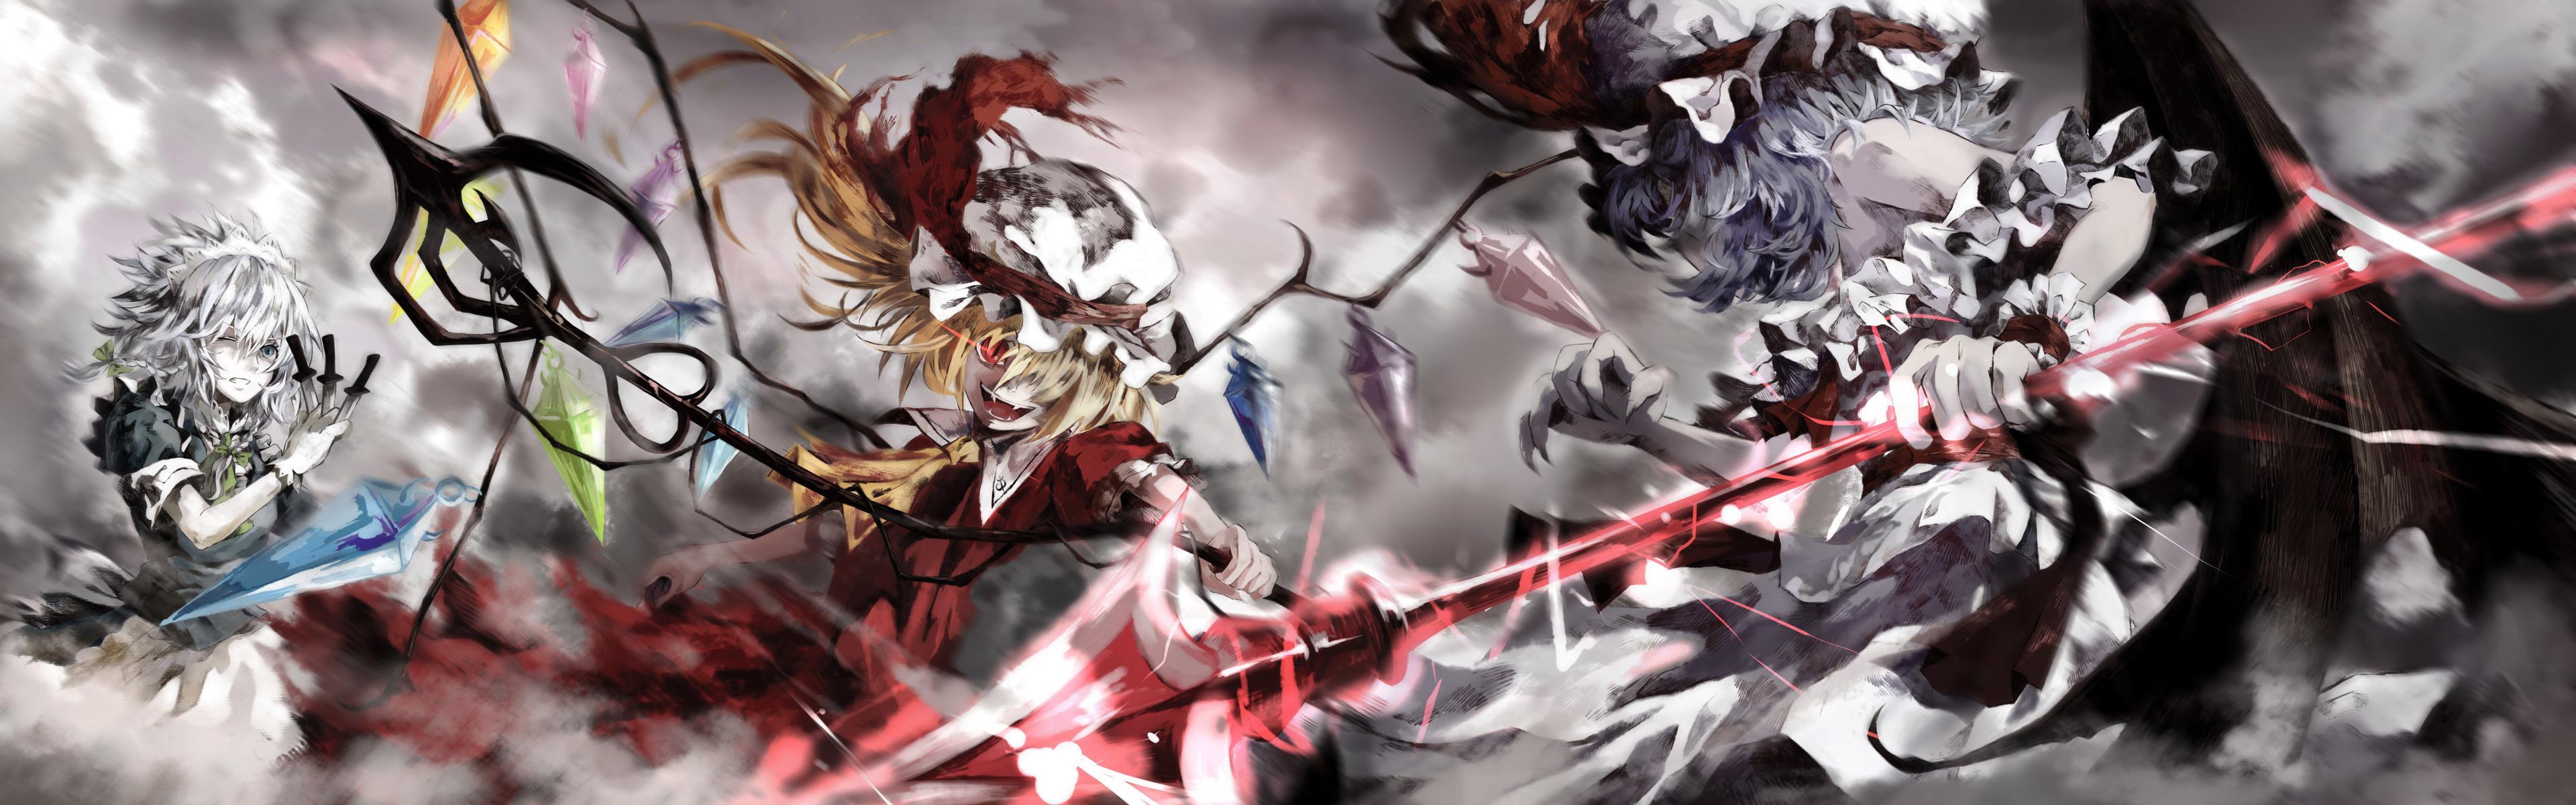 40+ Best Dual Screen Anime Wallpaper 4K Images - Anime ...